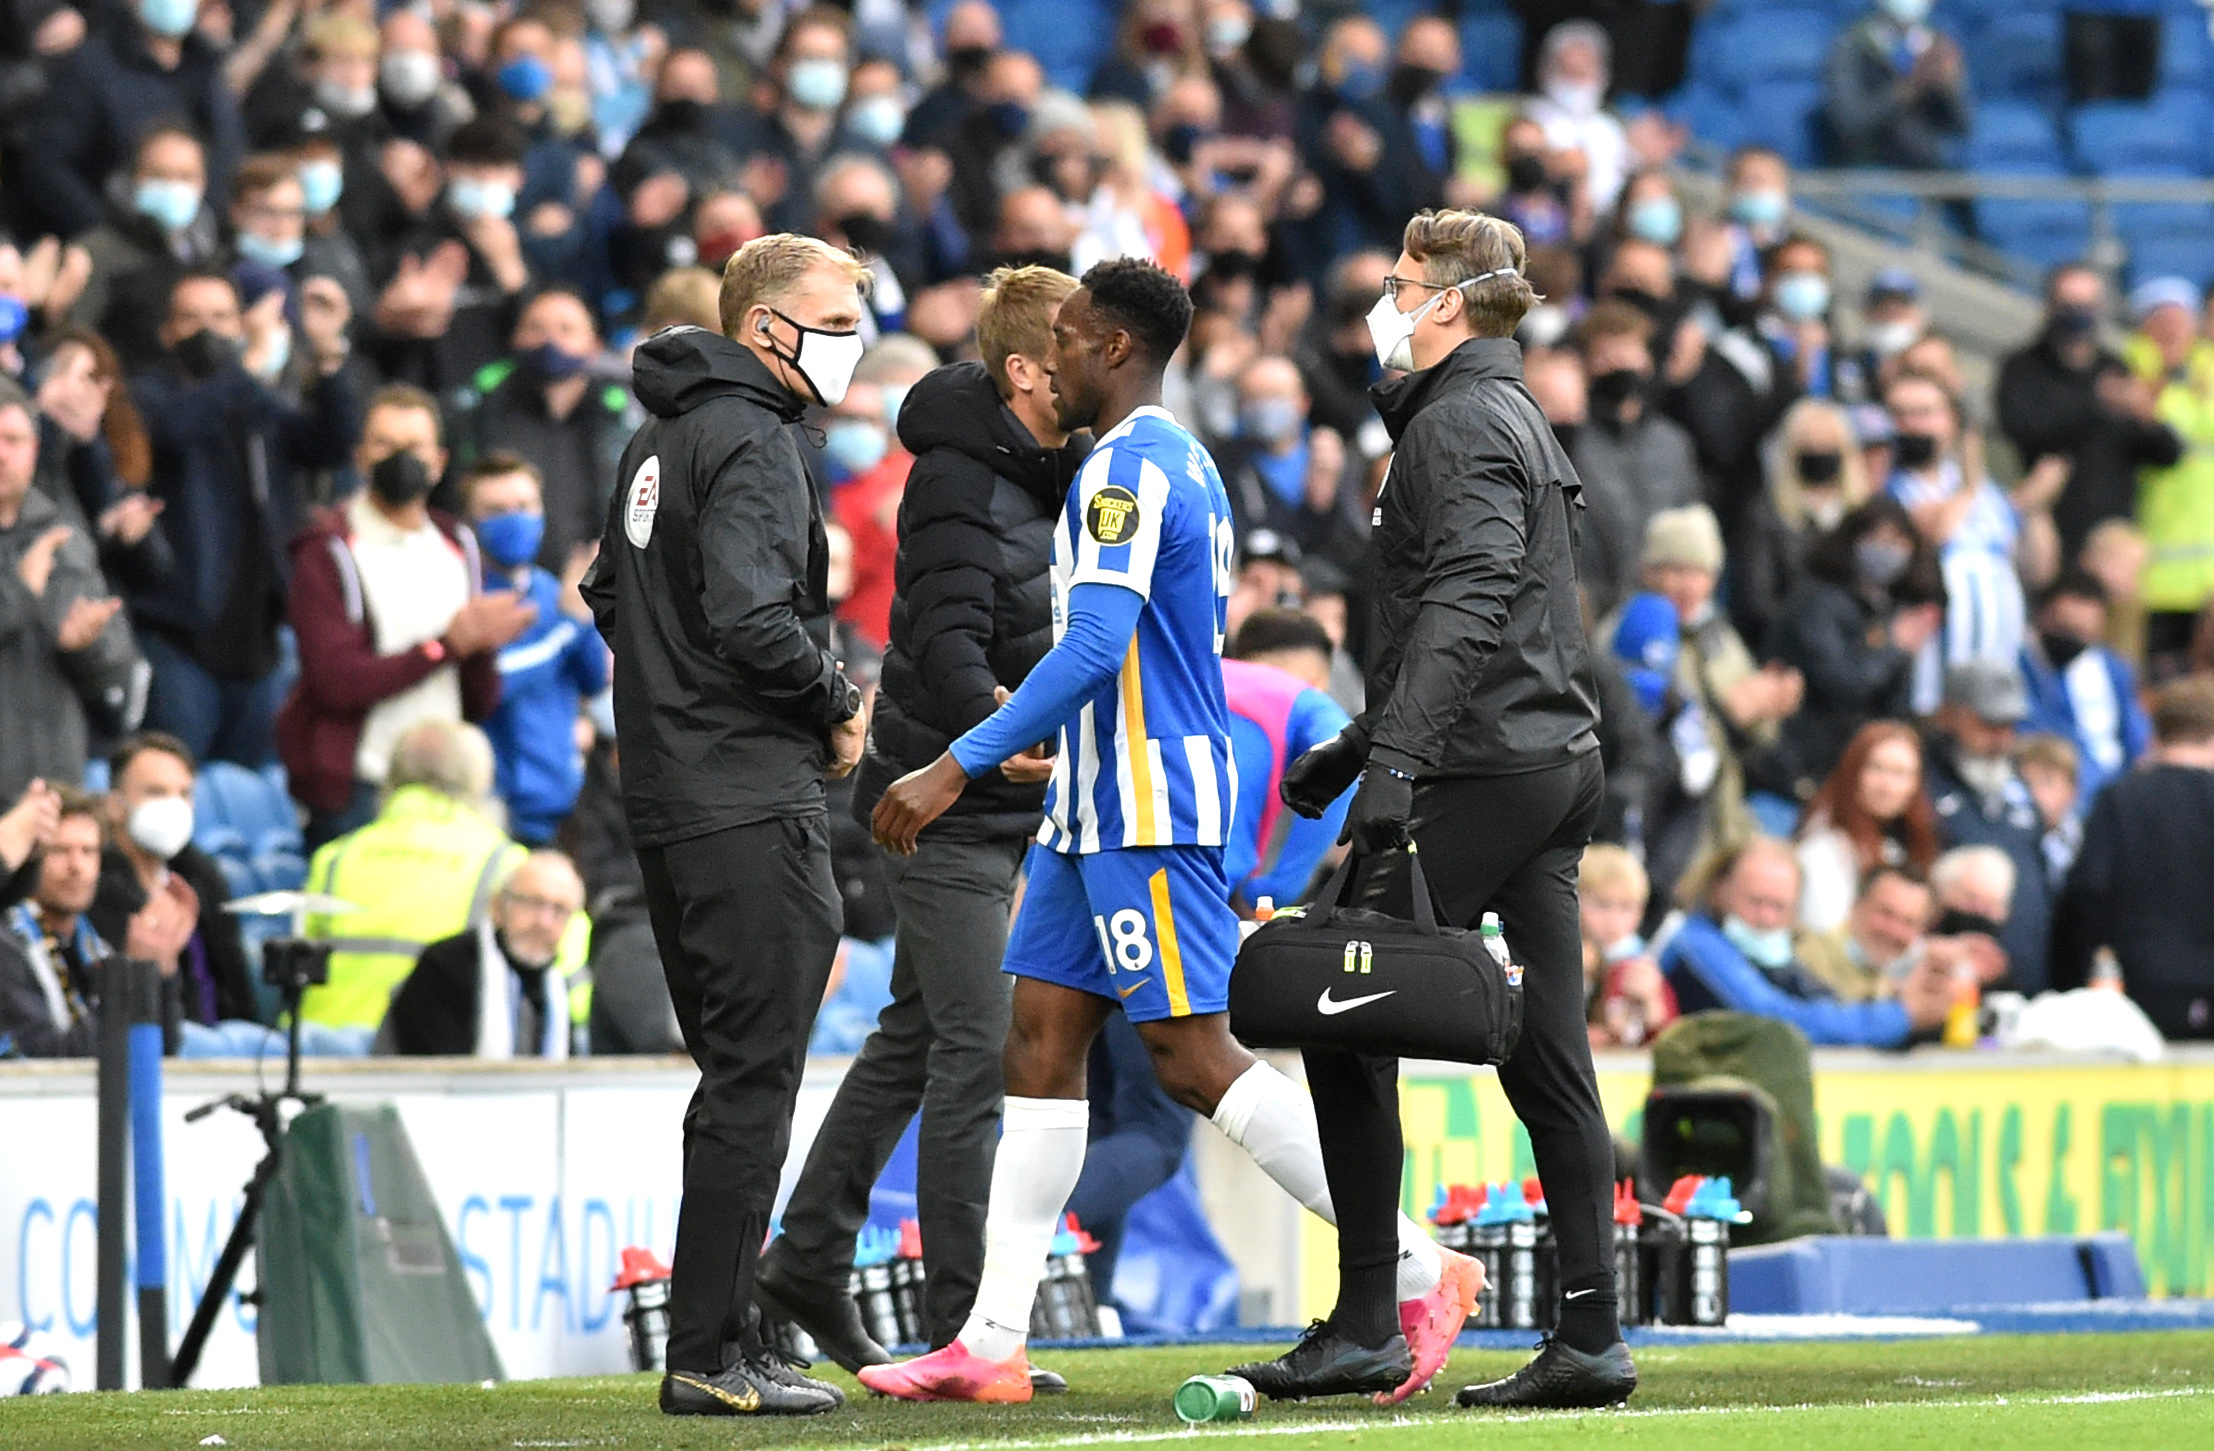 Brighton striker Danny Welbeck ruled out until September